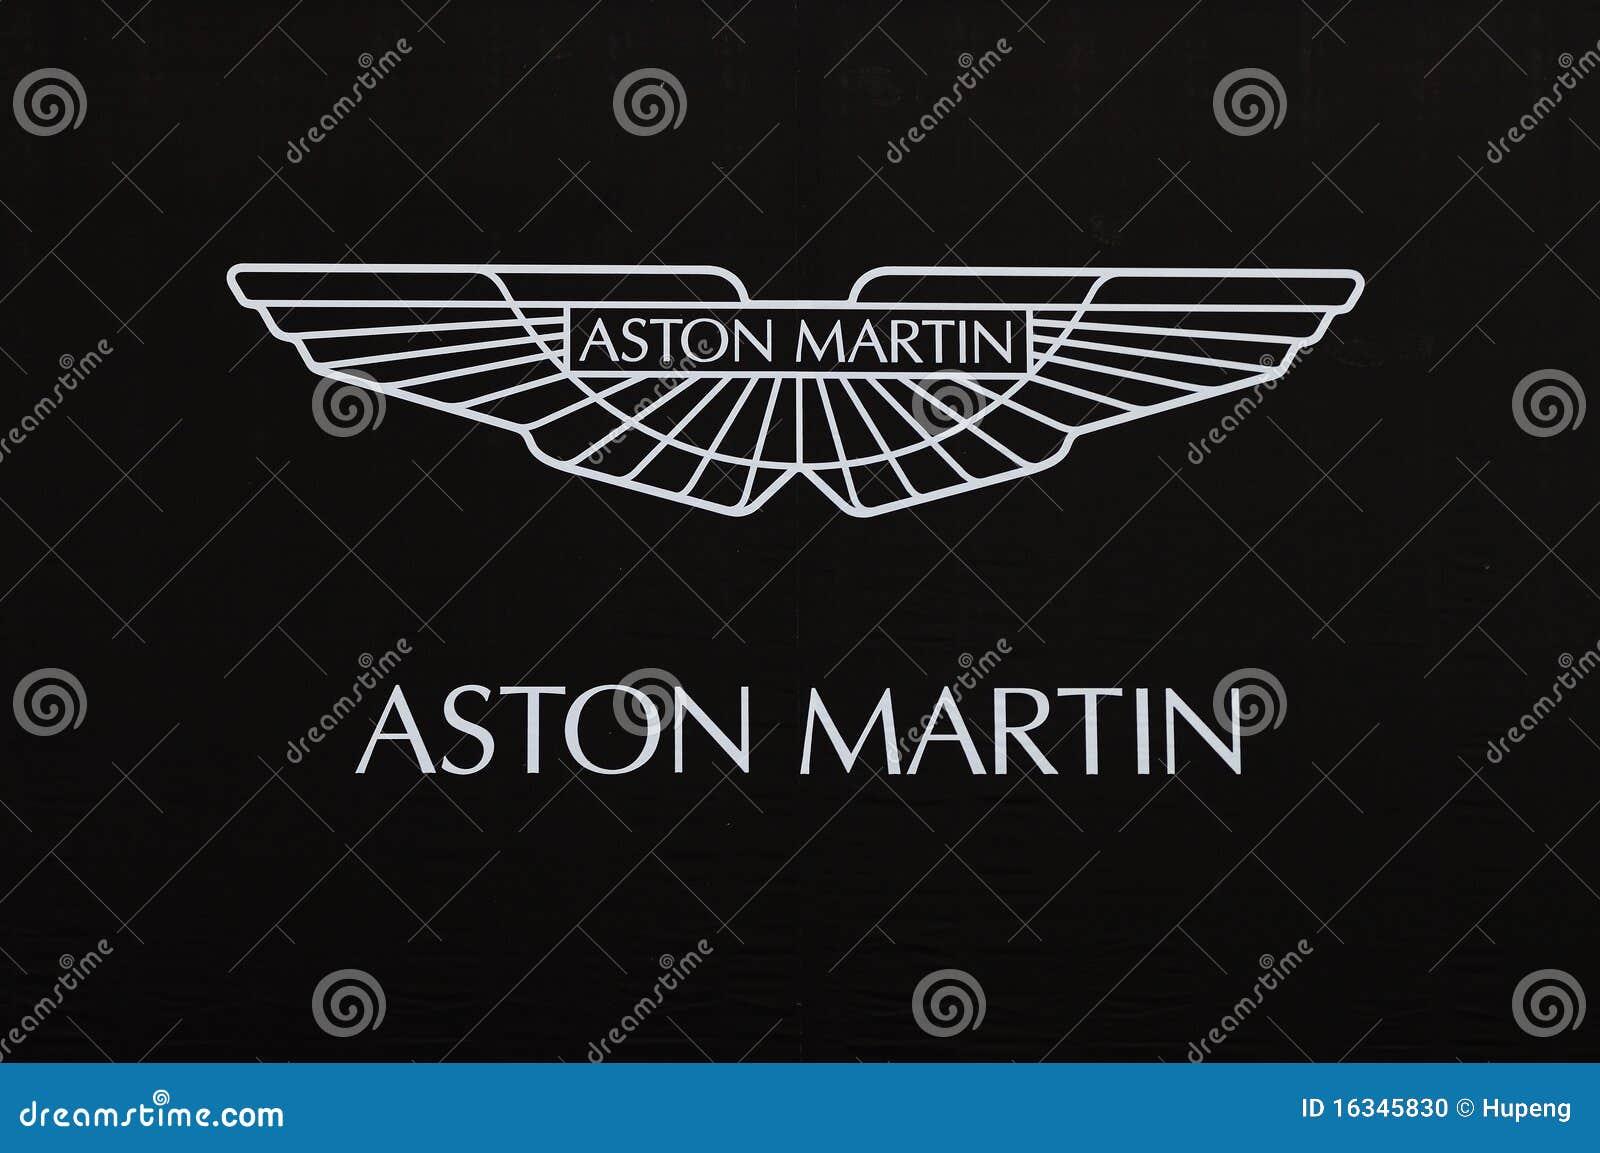 Aston Martin Used >> Aston Martin Logo Editorial Image - Image: 16345830